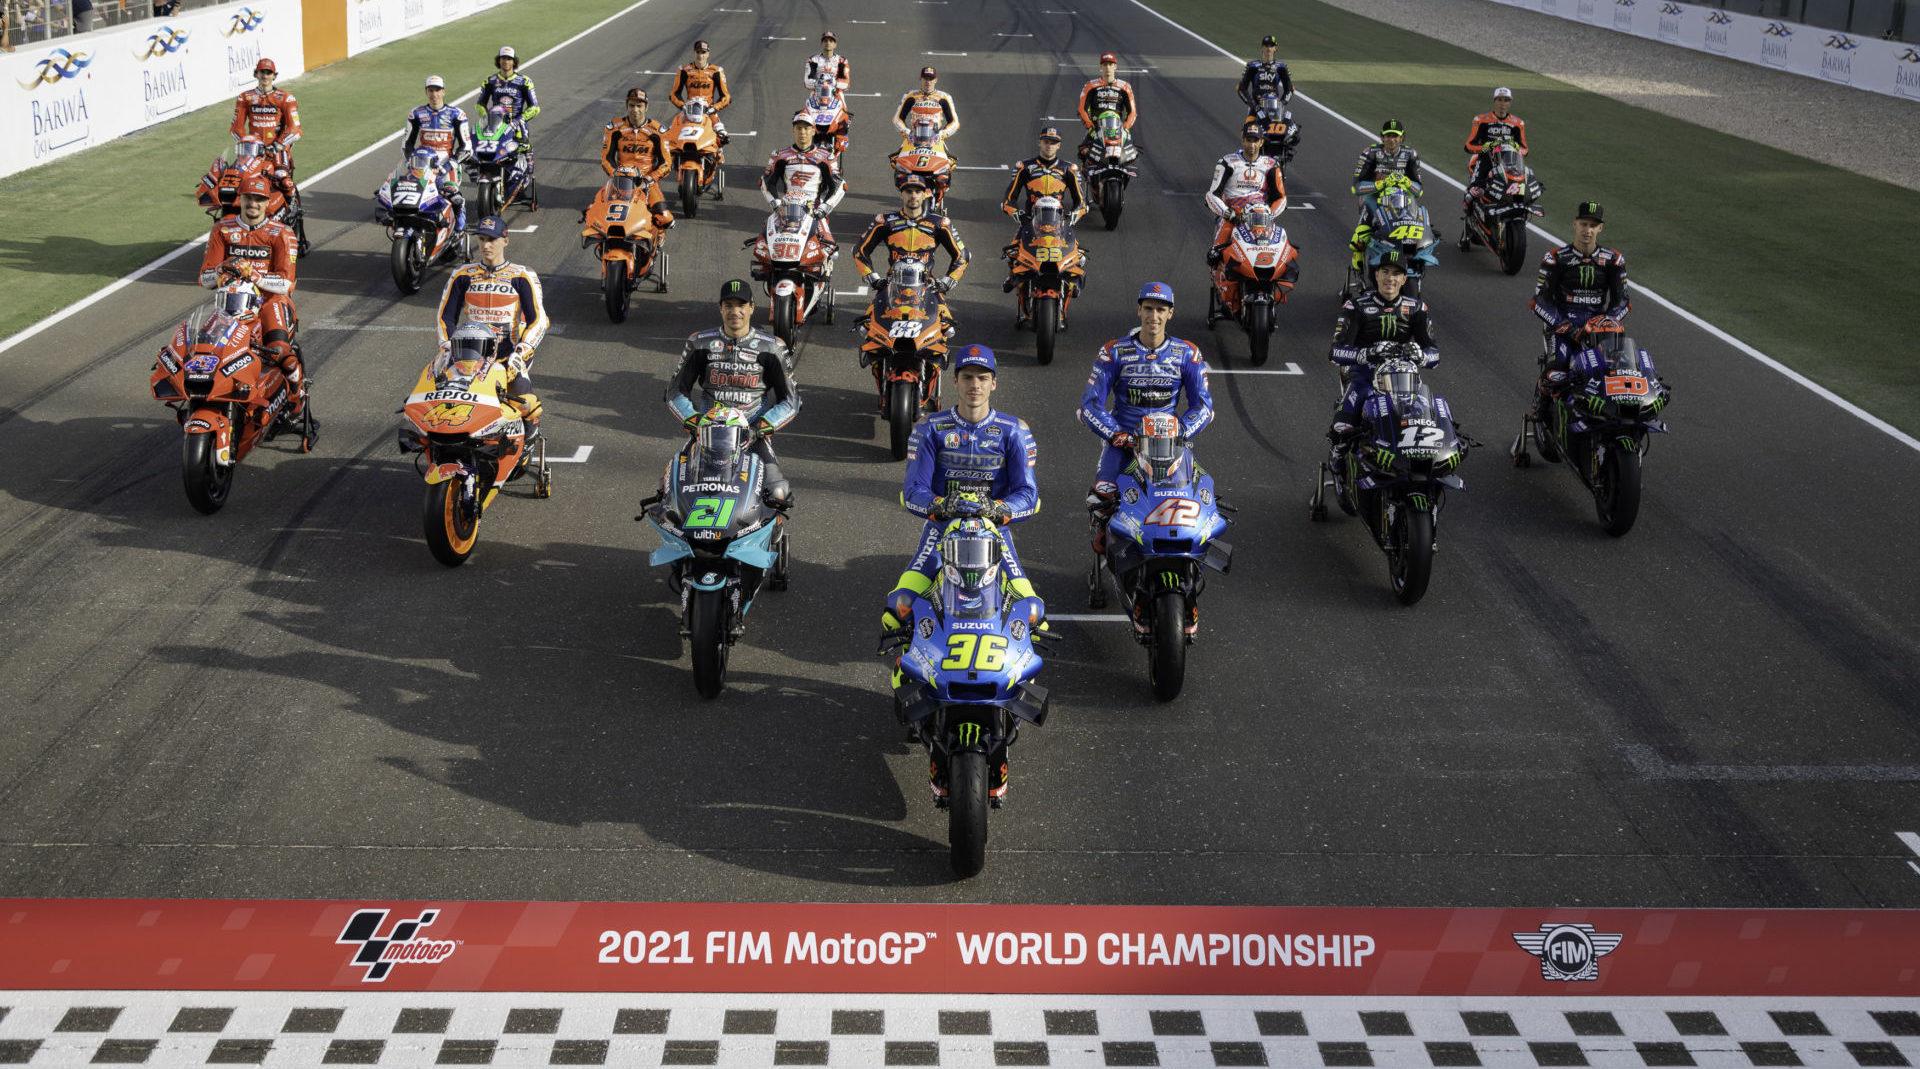 The 2021 MotoGP World Championship field of riders. Photo courtesy Dorna.